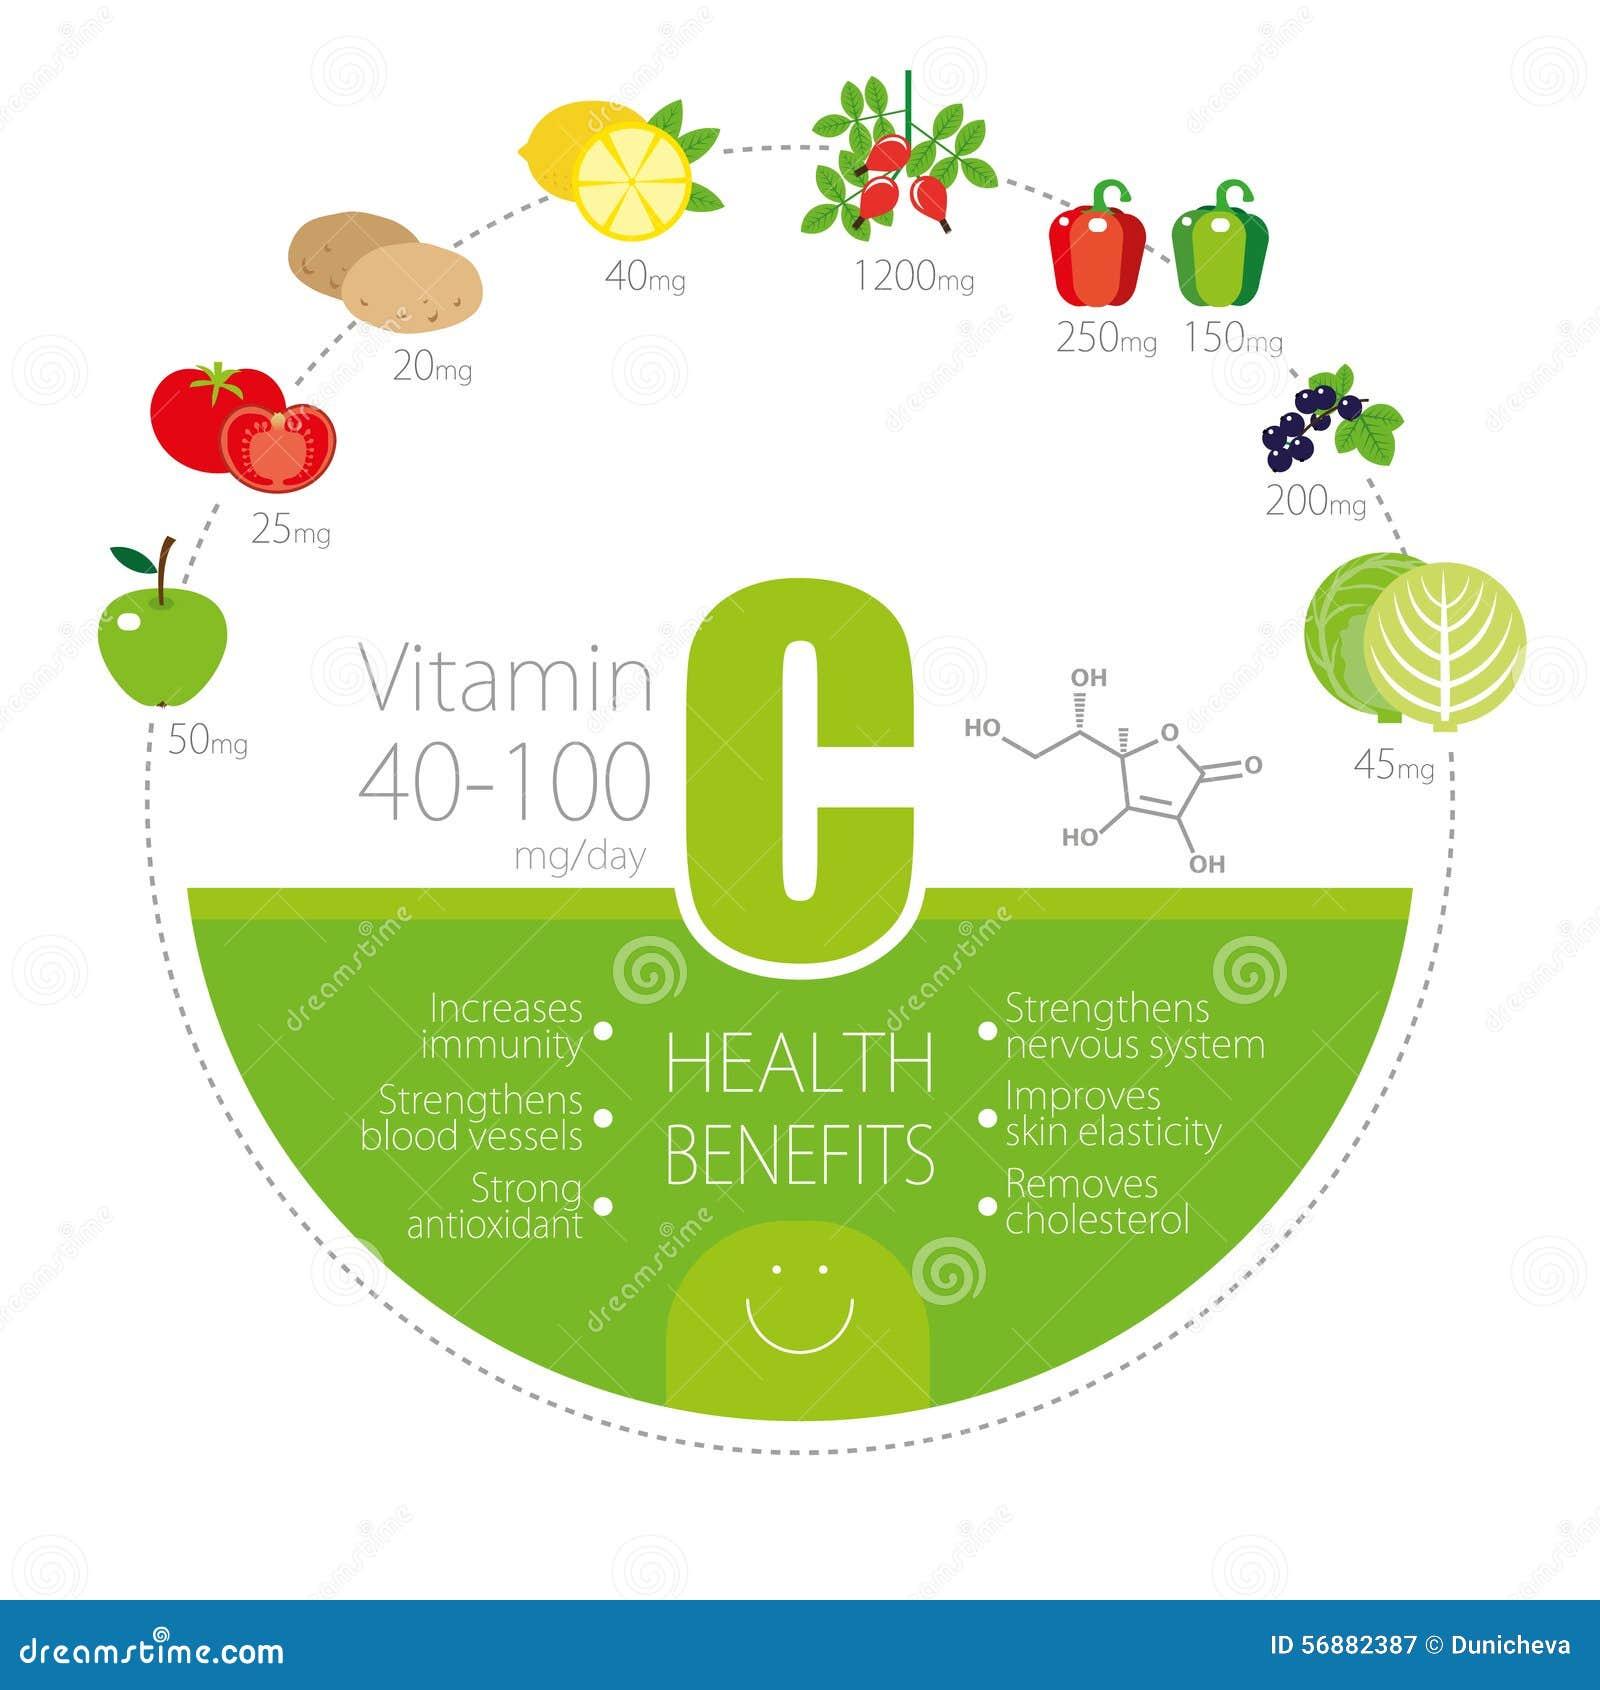 Stile di vita sano infographic - vitamina C in frutta ed in verdure